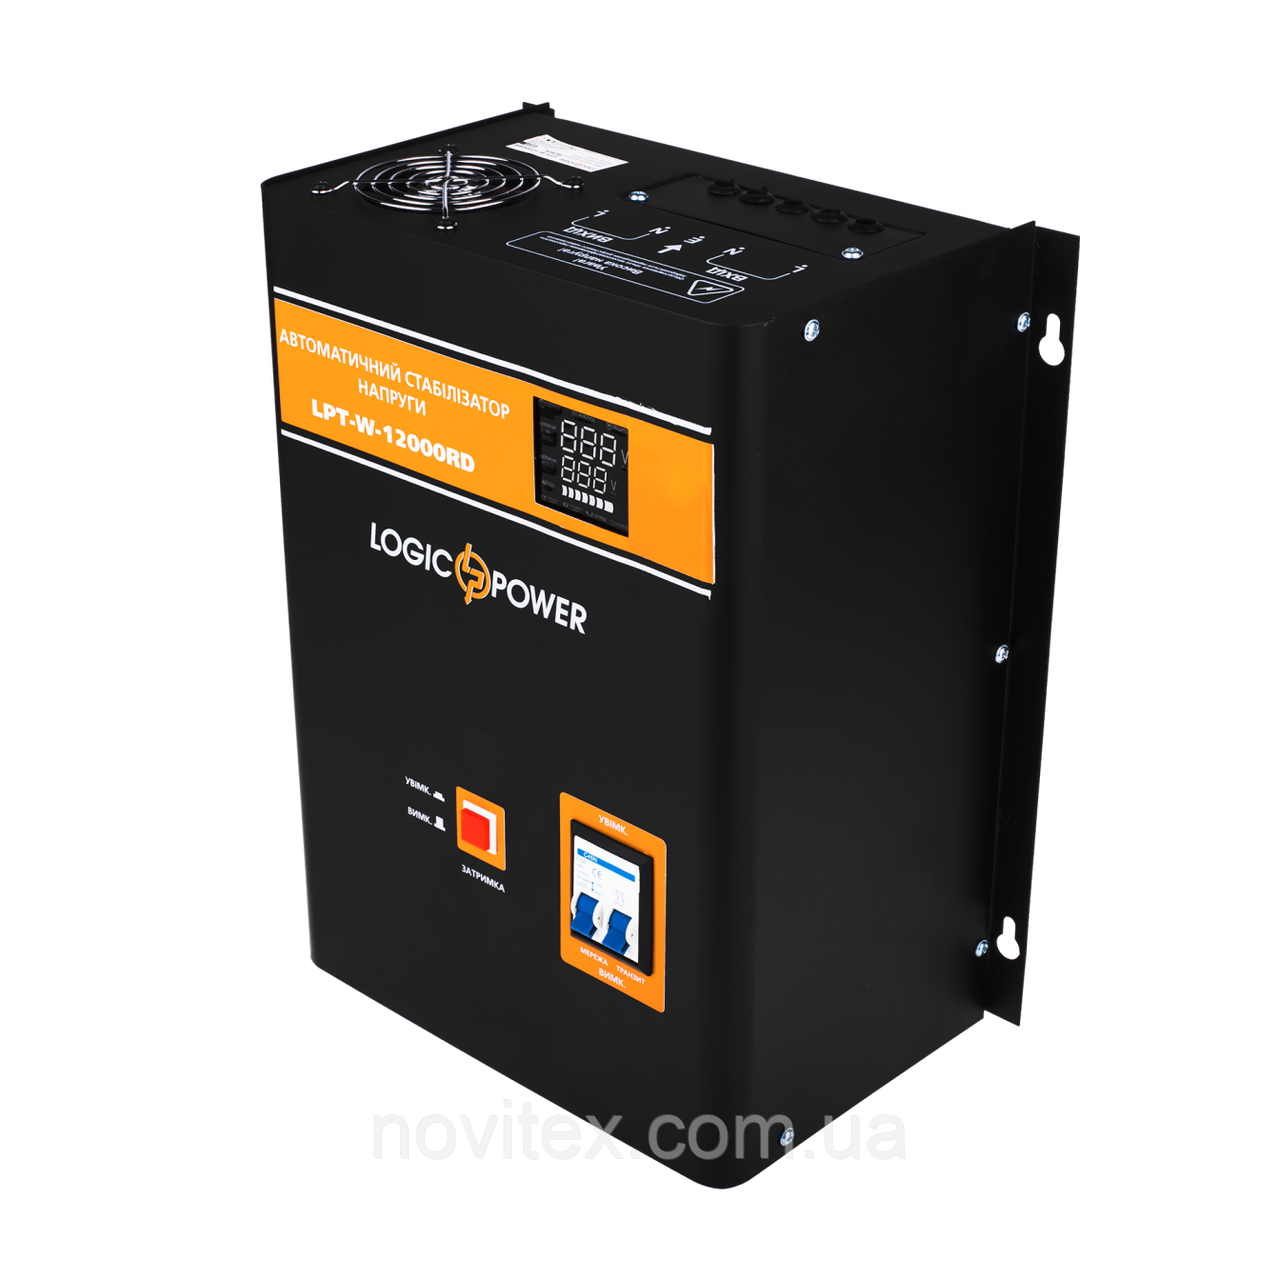 Стабилизатор напряжения Logicpower LPT-W-12000RD (8400Вт)